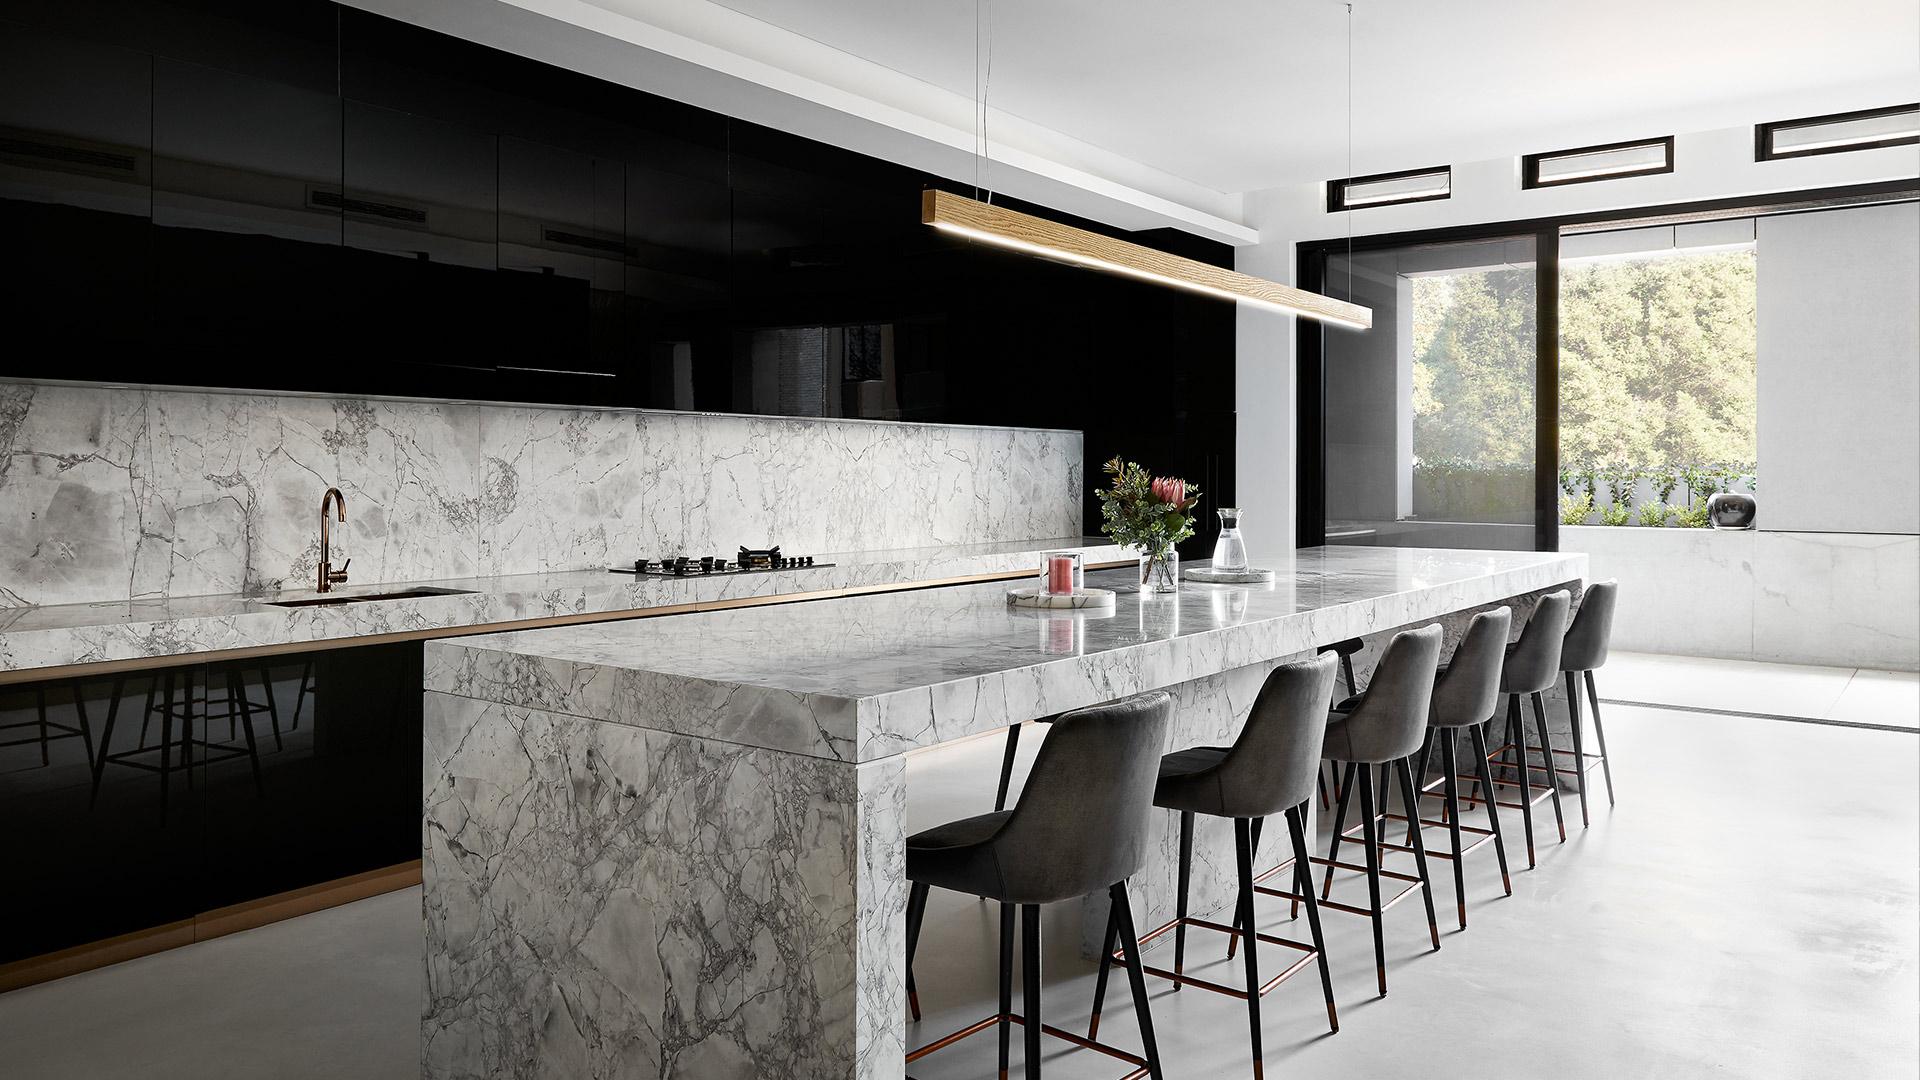 Conquest™ Crowne Plaza kitchen